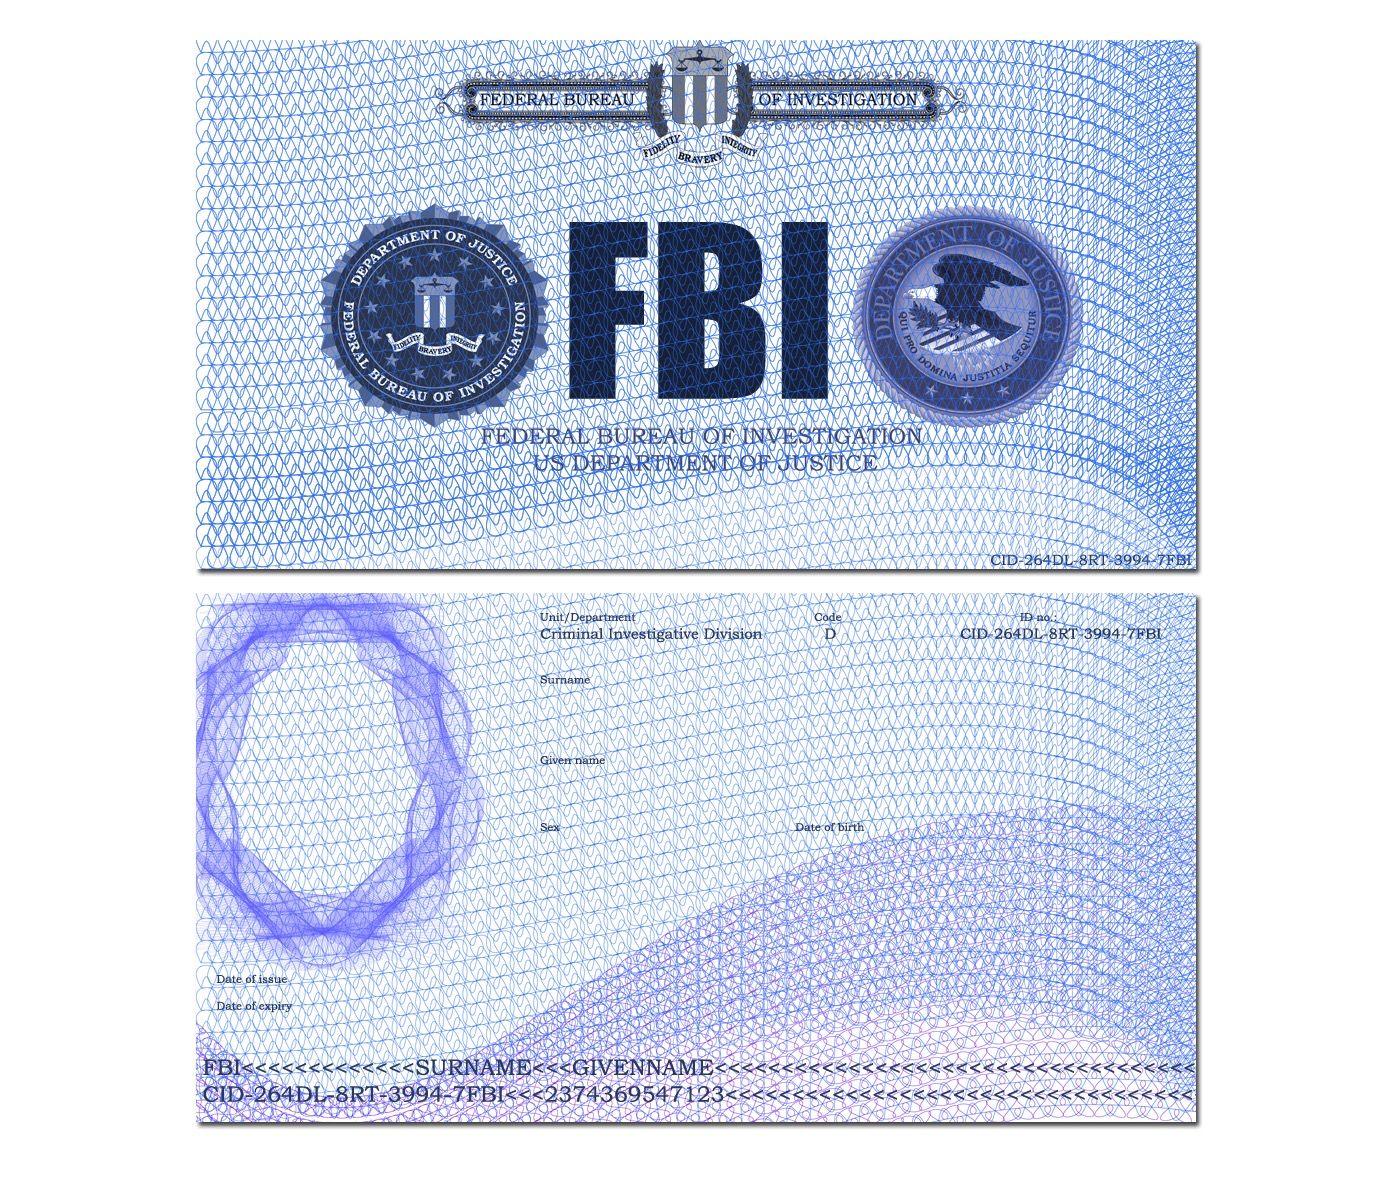 Pin By Miguel Angel Perez On Fbi Id Etc Id Card Template Card Template Flash Card Template